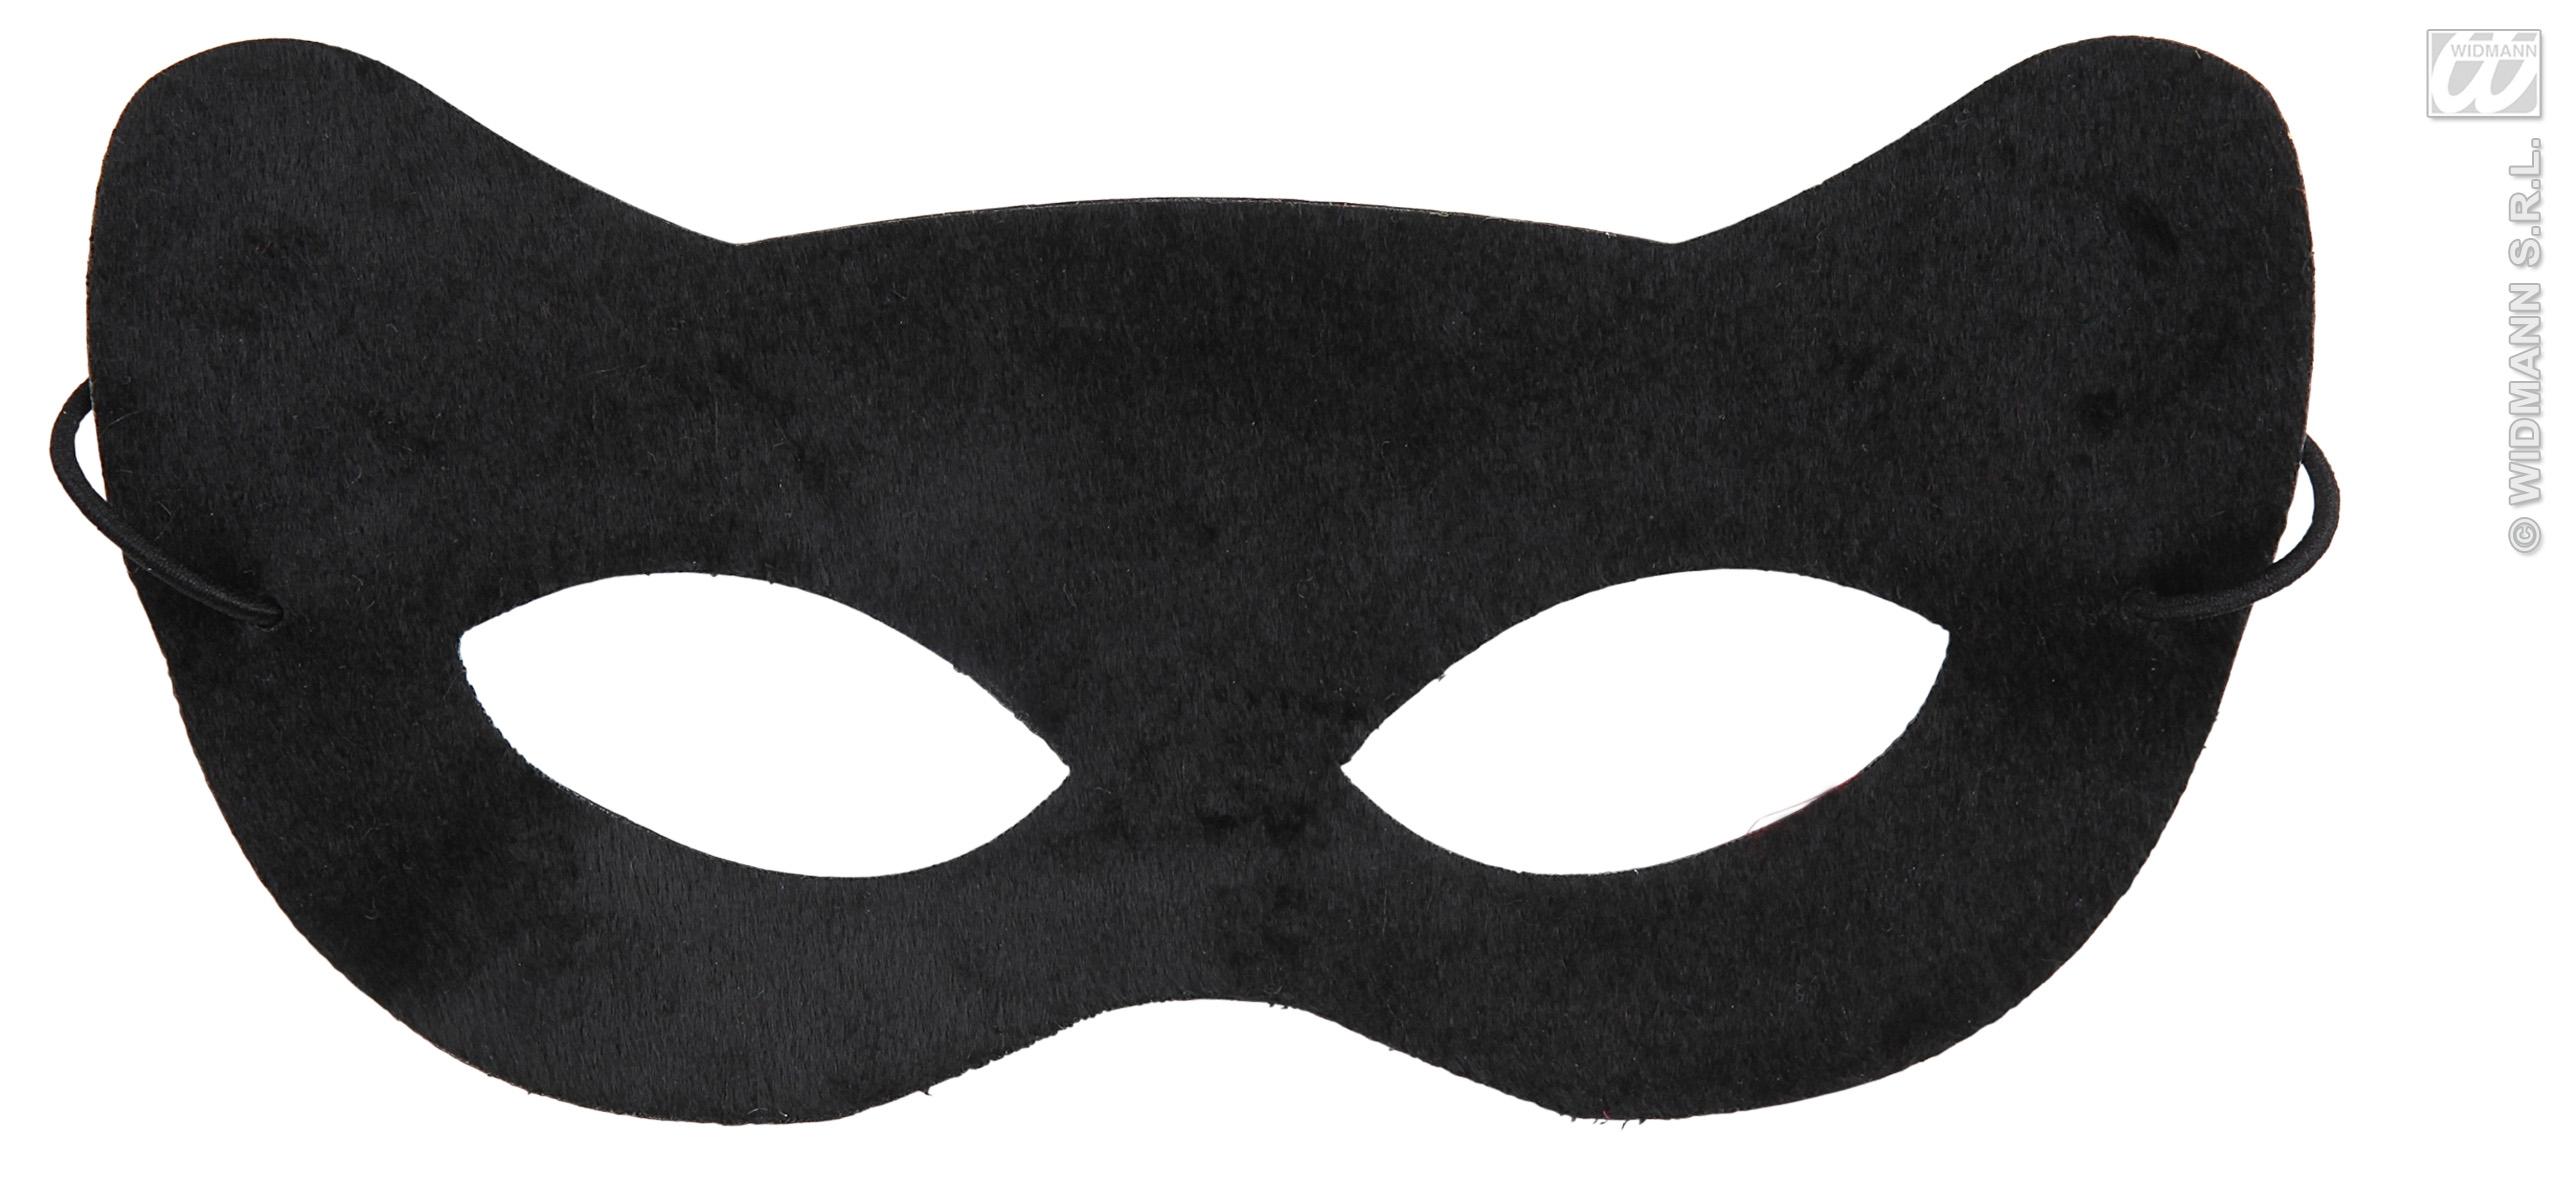 Mask clipart cat woman Eye Ears Mask Cat Halloween